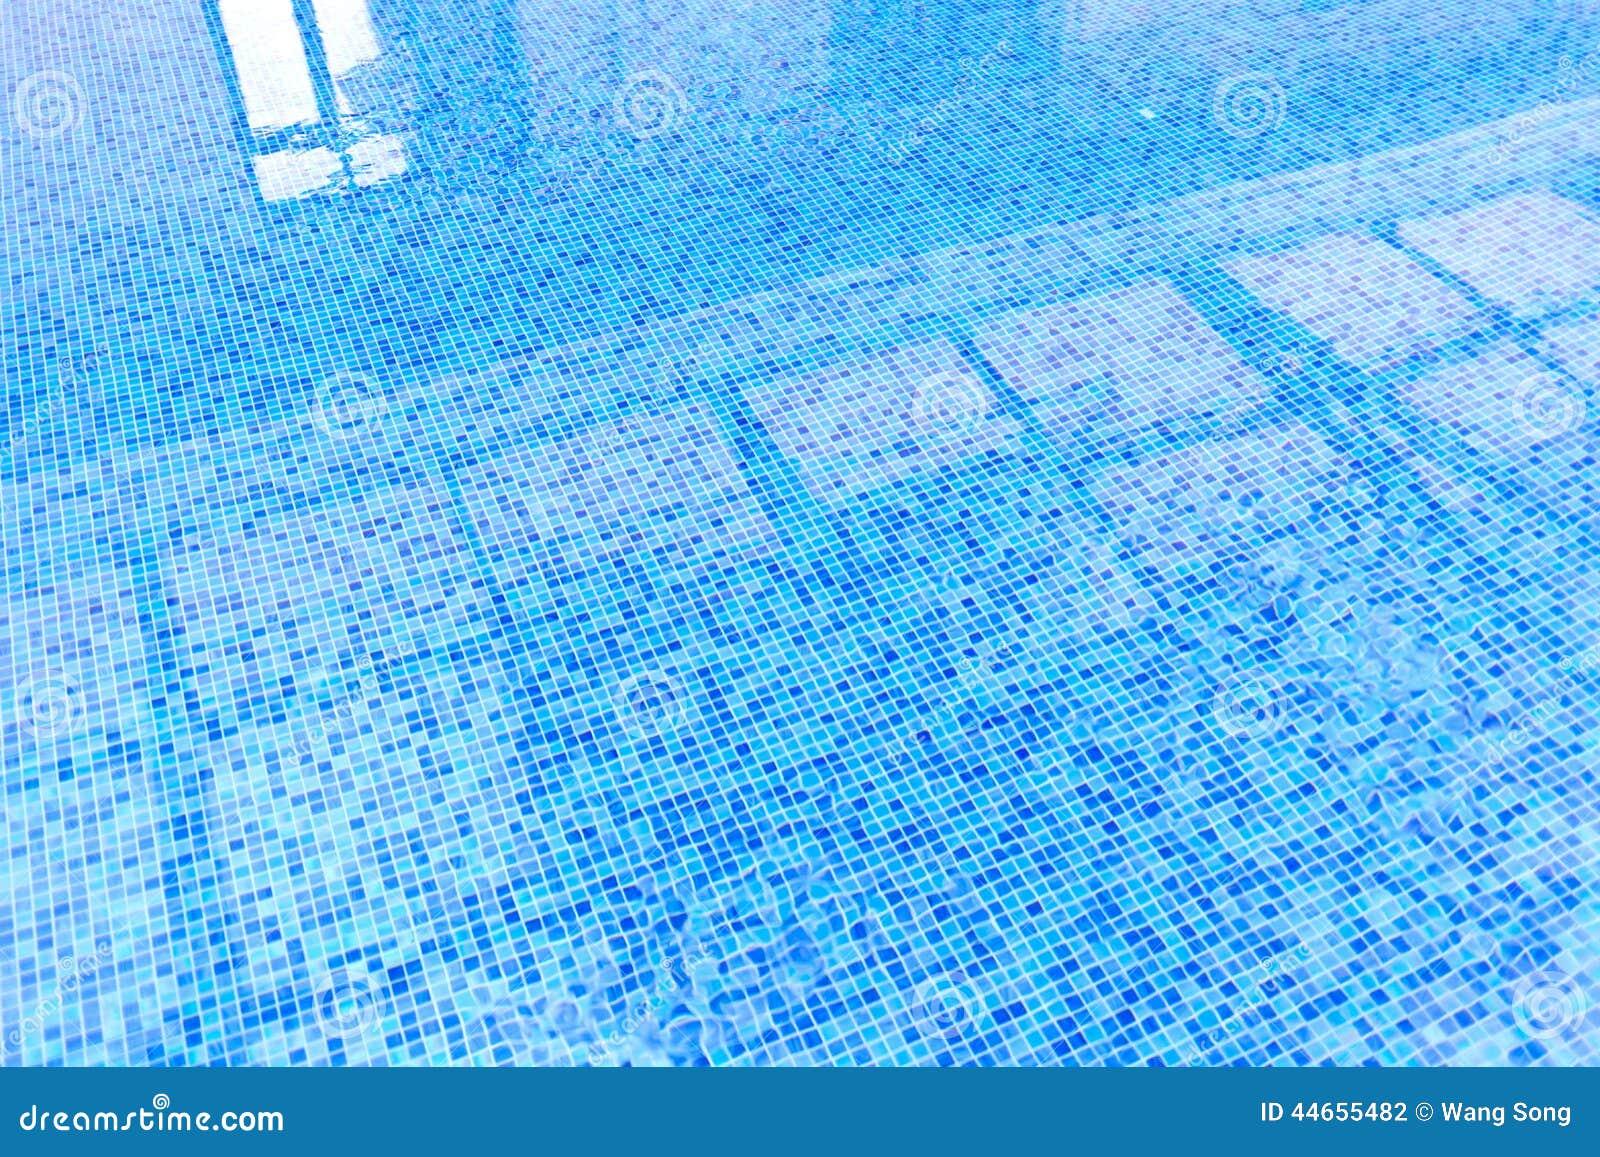 swimming pool water close - photo #23